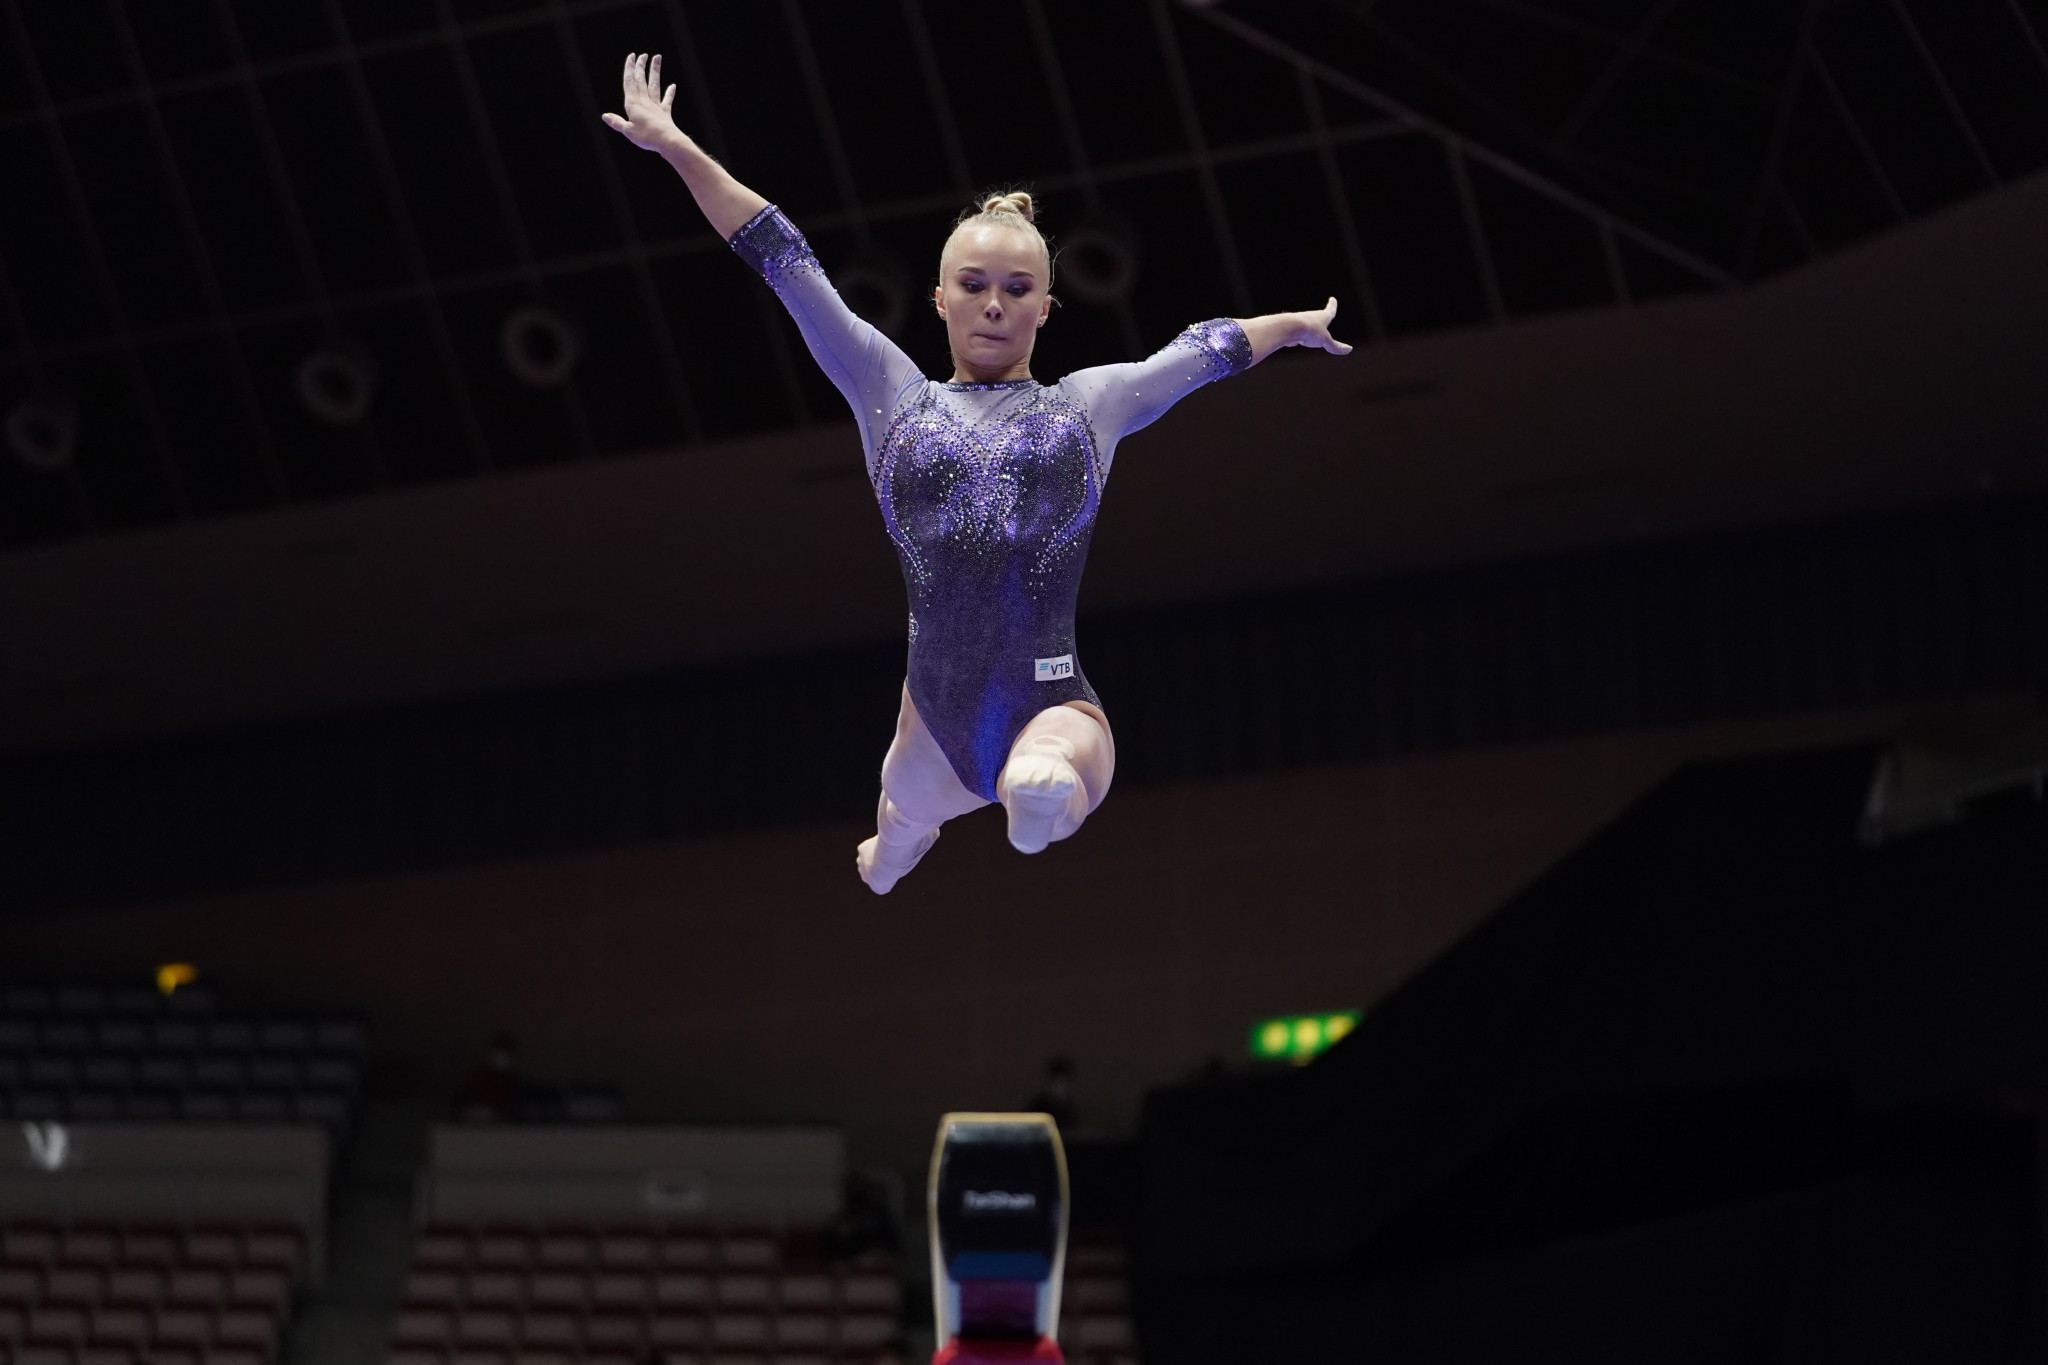 Melnikova tops all-around qualifying at Artistic Gymnastics World Championships